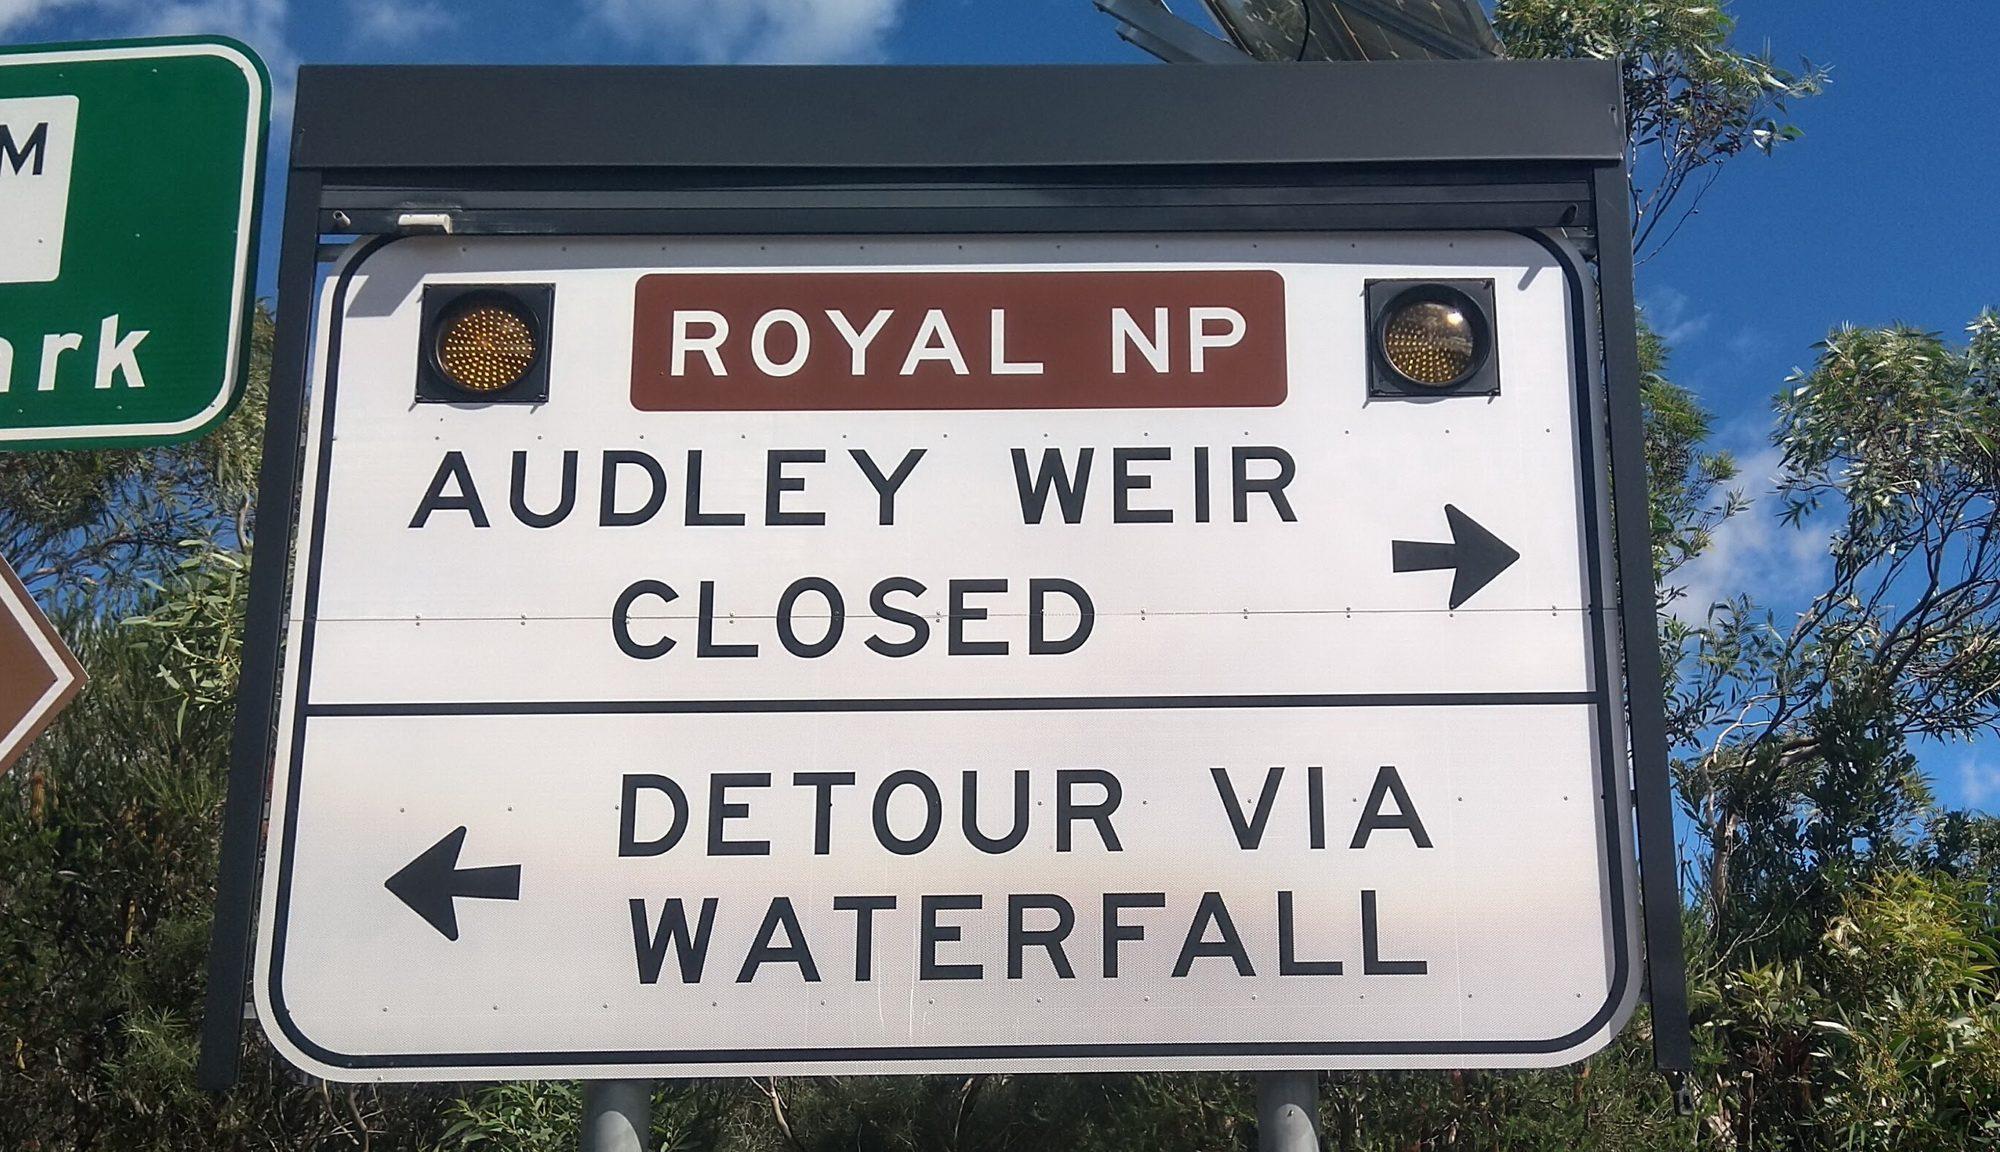 Audley Weir Closed Sign Bundeena Turnoff